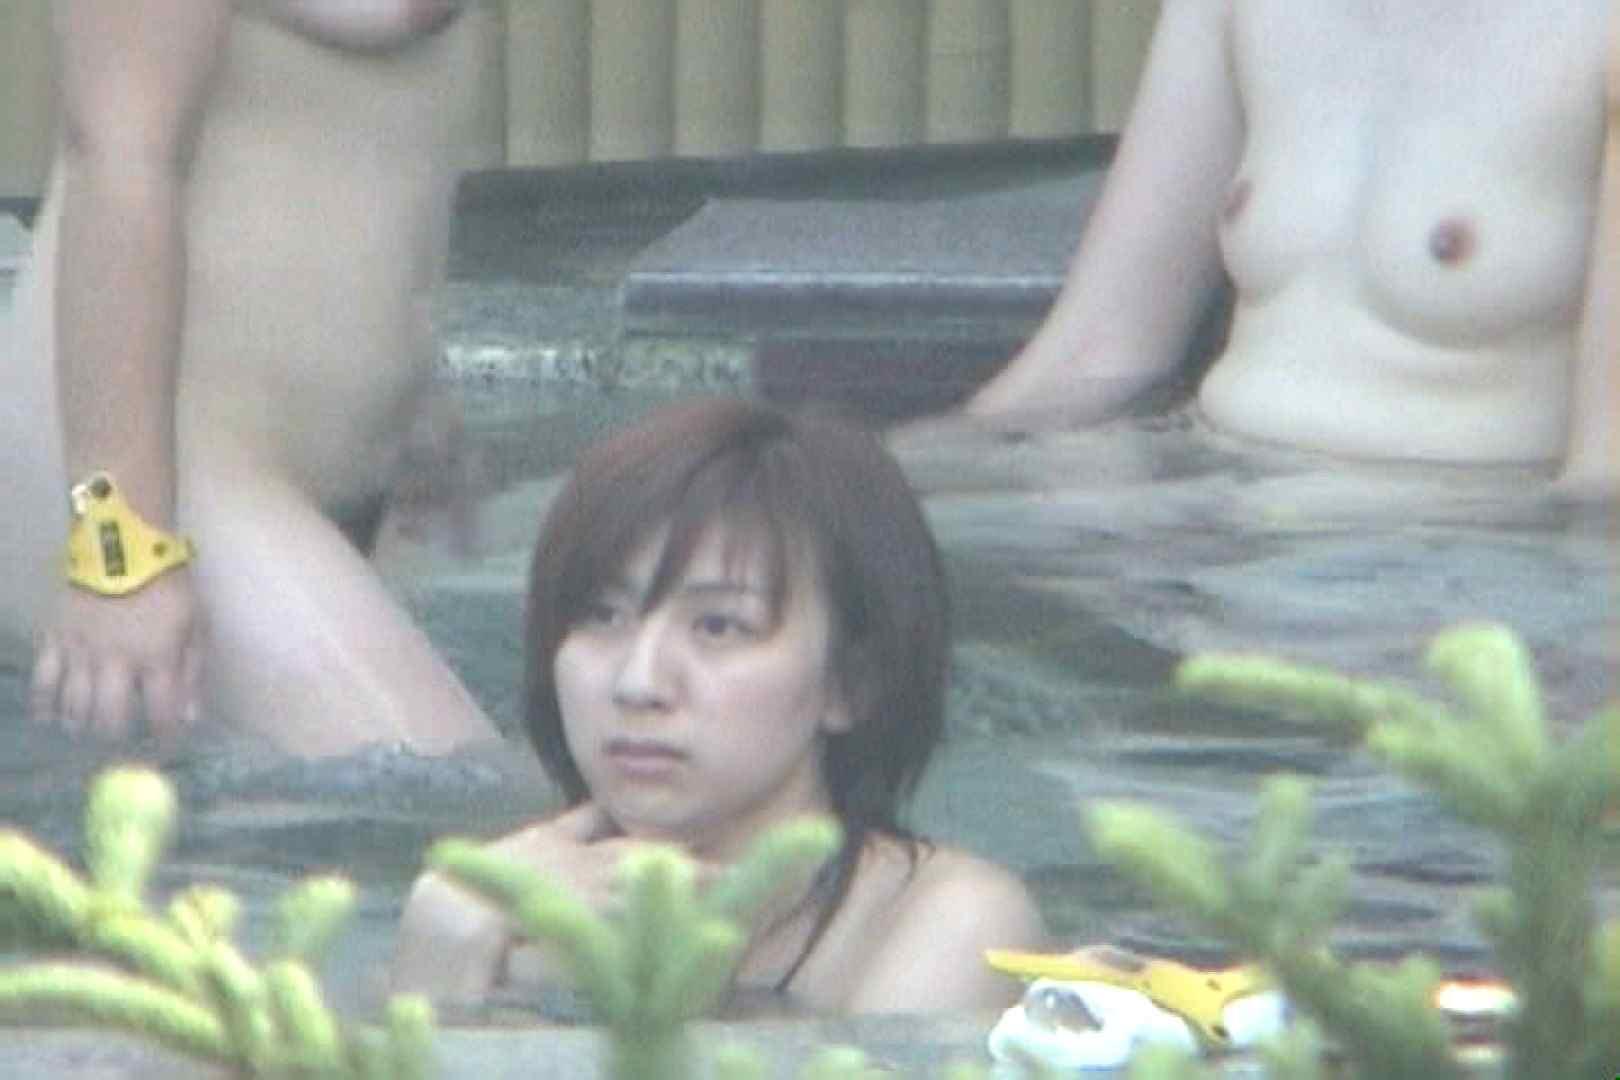 Aquaな露天風呂Vol.77【VIP限定】 露天風呂編 | 盗撮シリーズ  100PIX 9